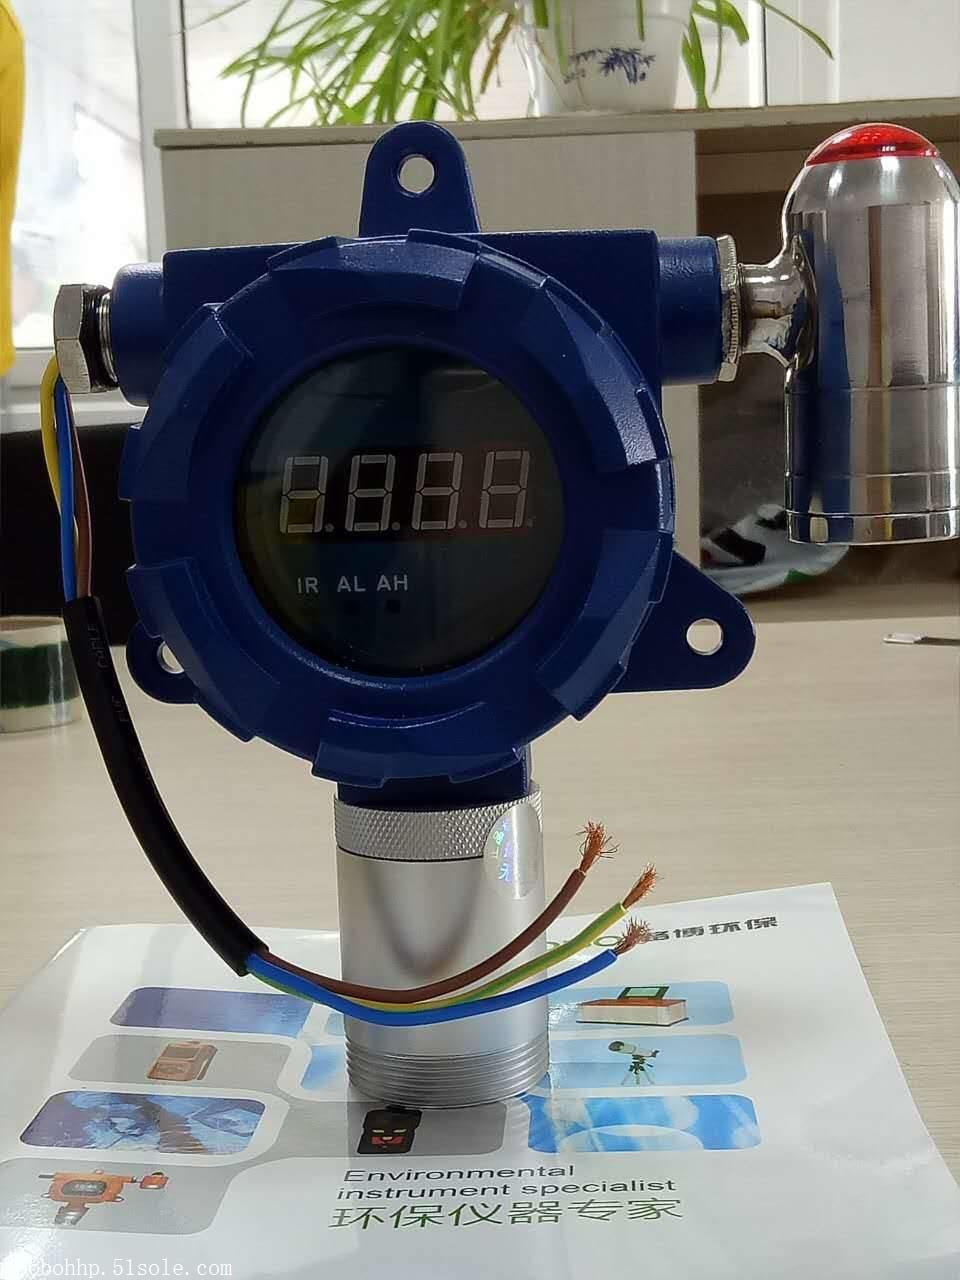 LB-BD 固定式气体检测仪 单一读数 简洁 方便 便捷